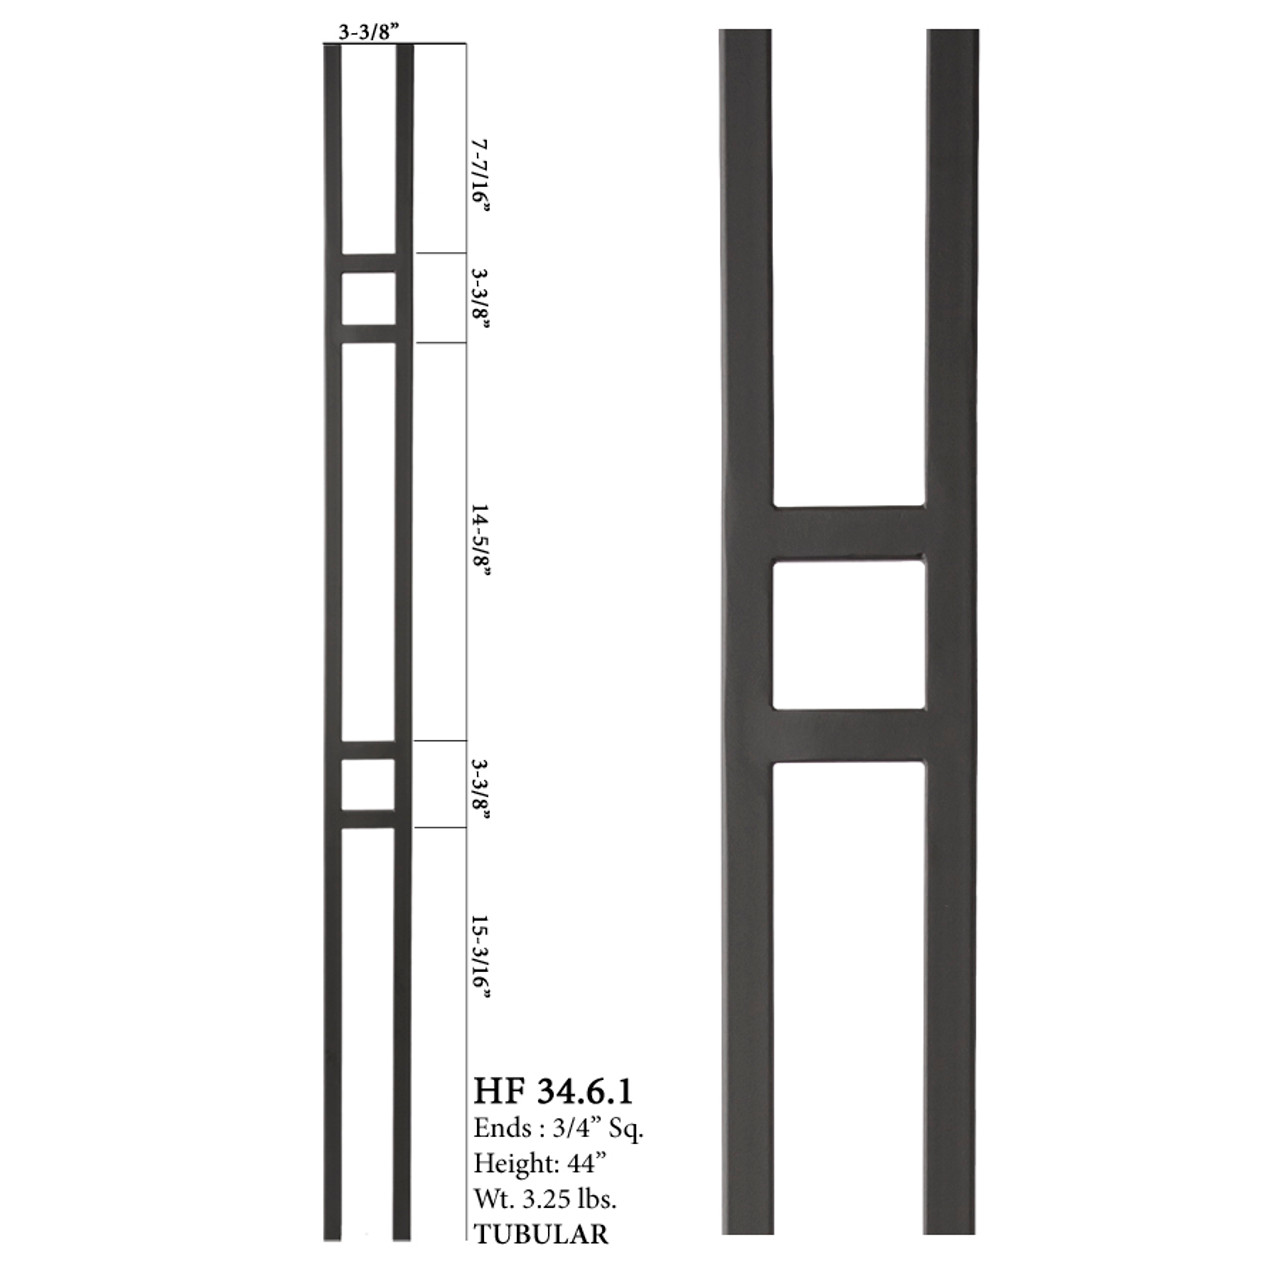 HF34.6.1 MEGA Double Square Aalto Steel Baluster